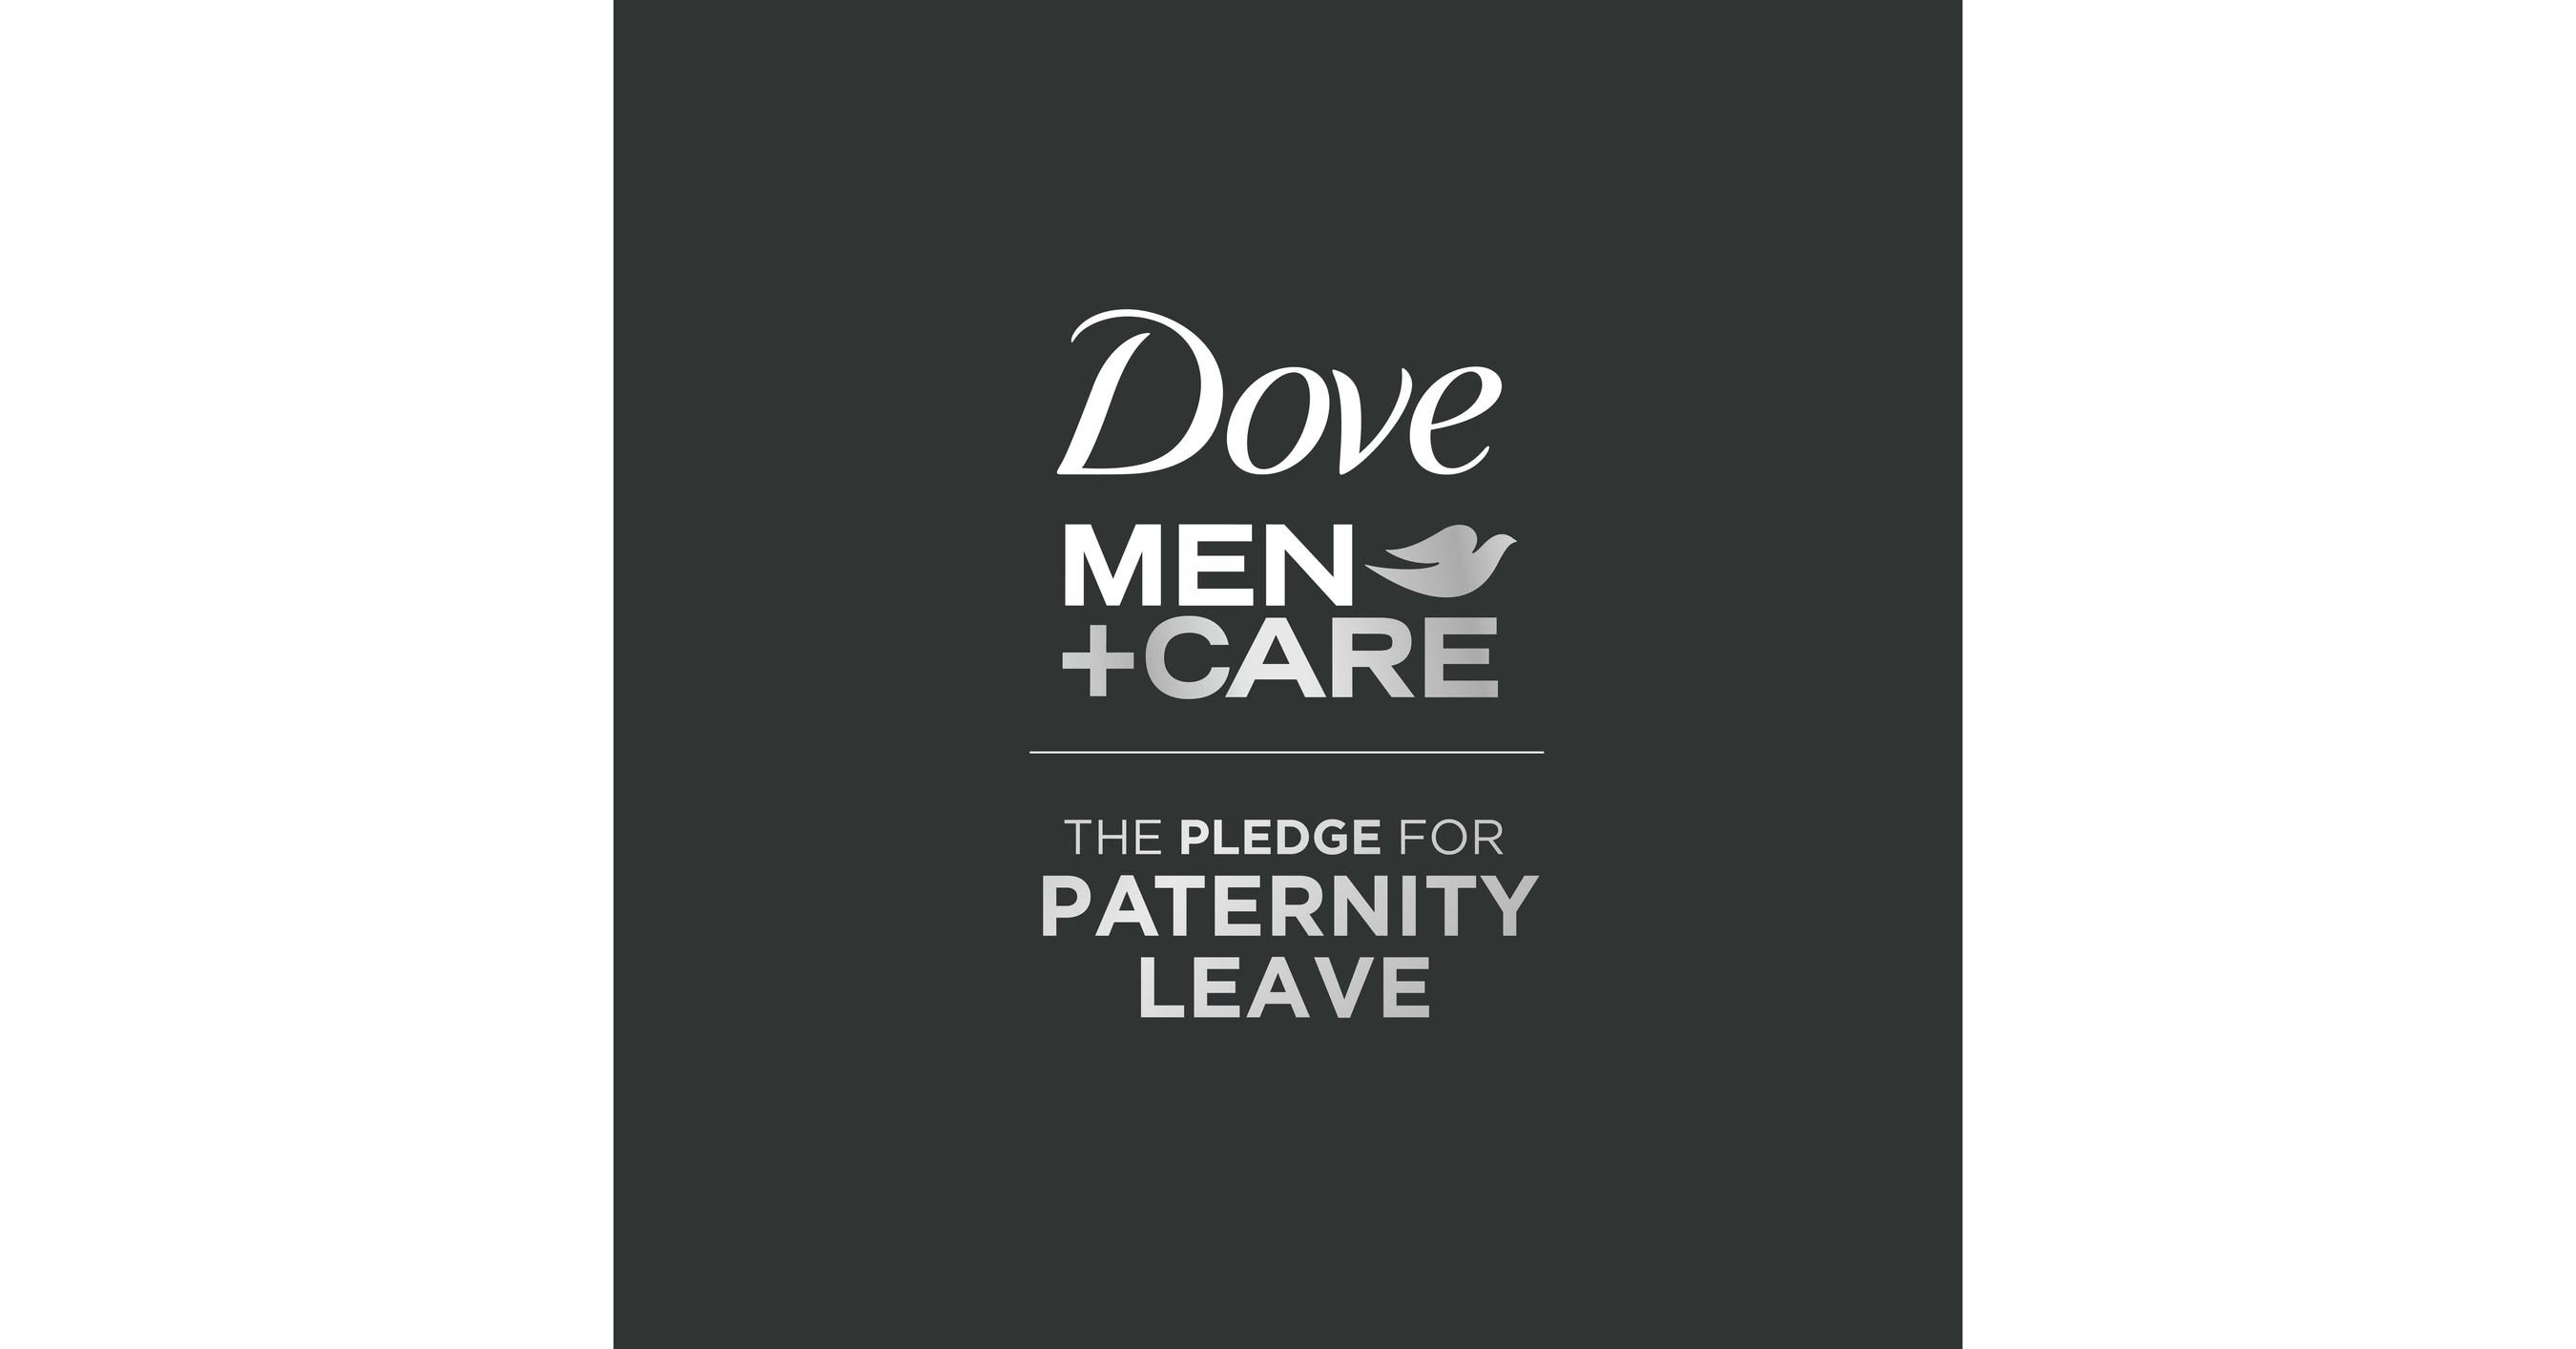 Dove men logo - photo#50